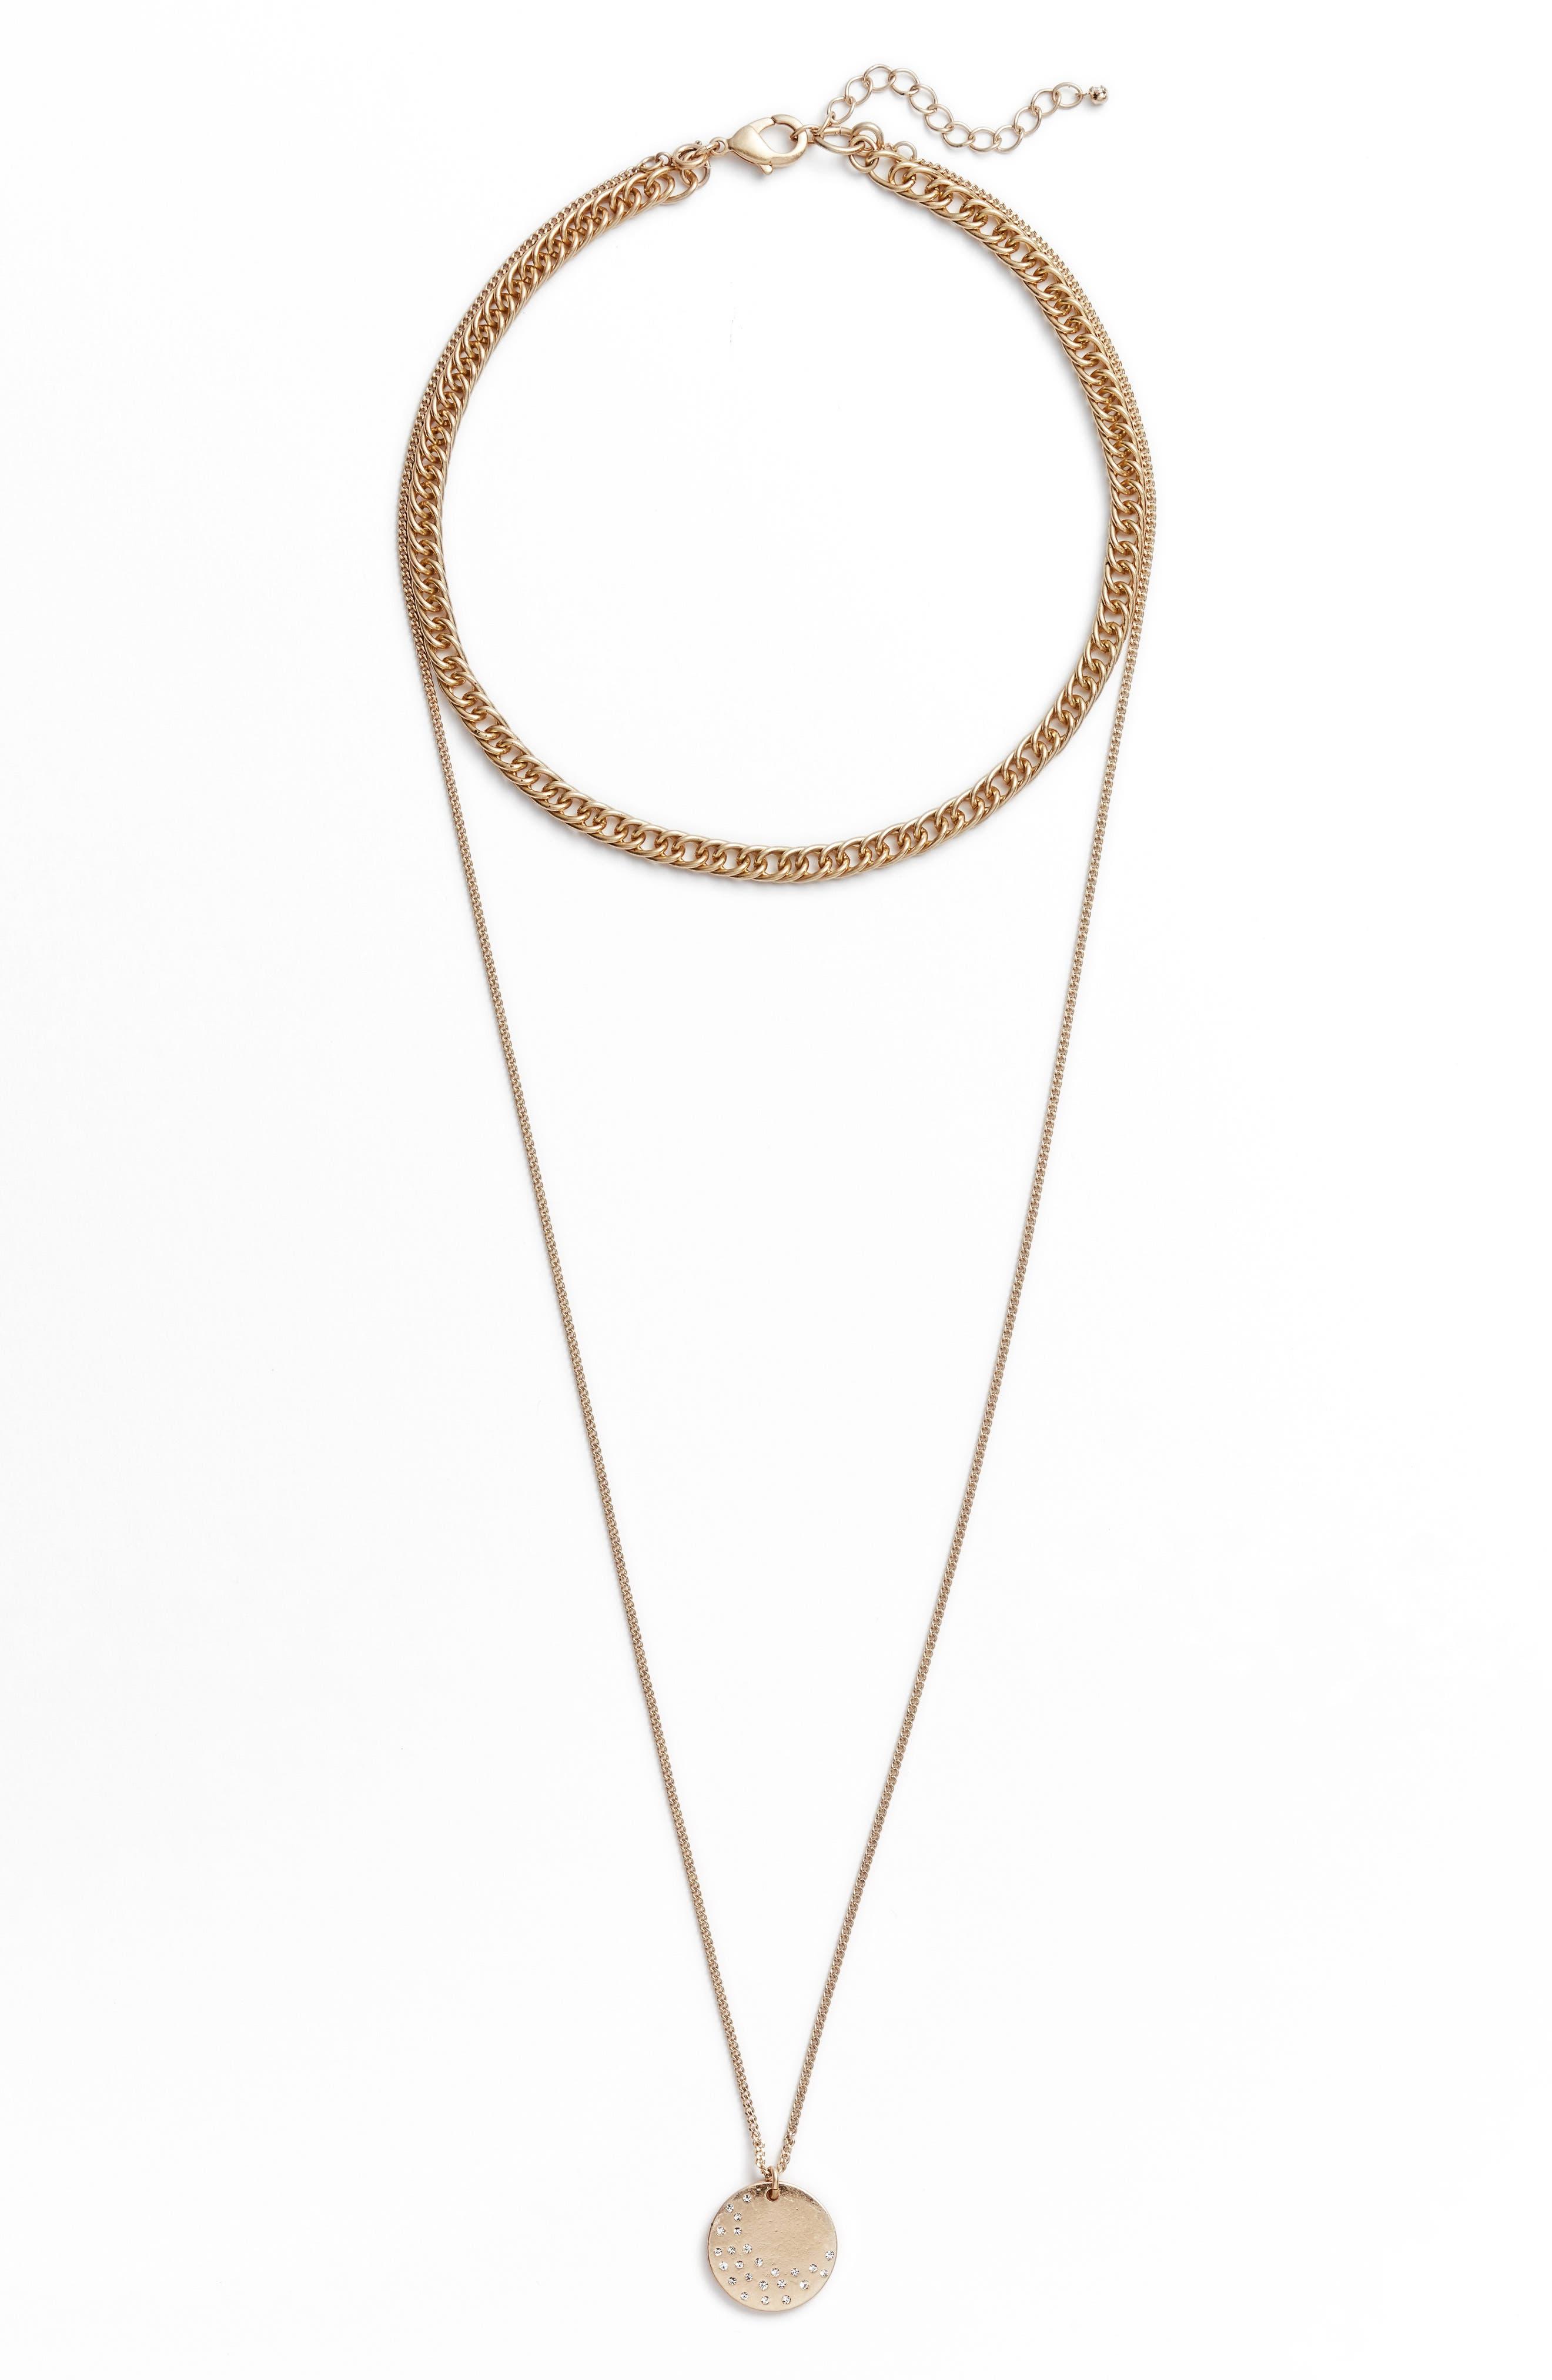 Treasure & Bond x Something Navy Multistrand Necklace